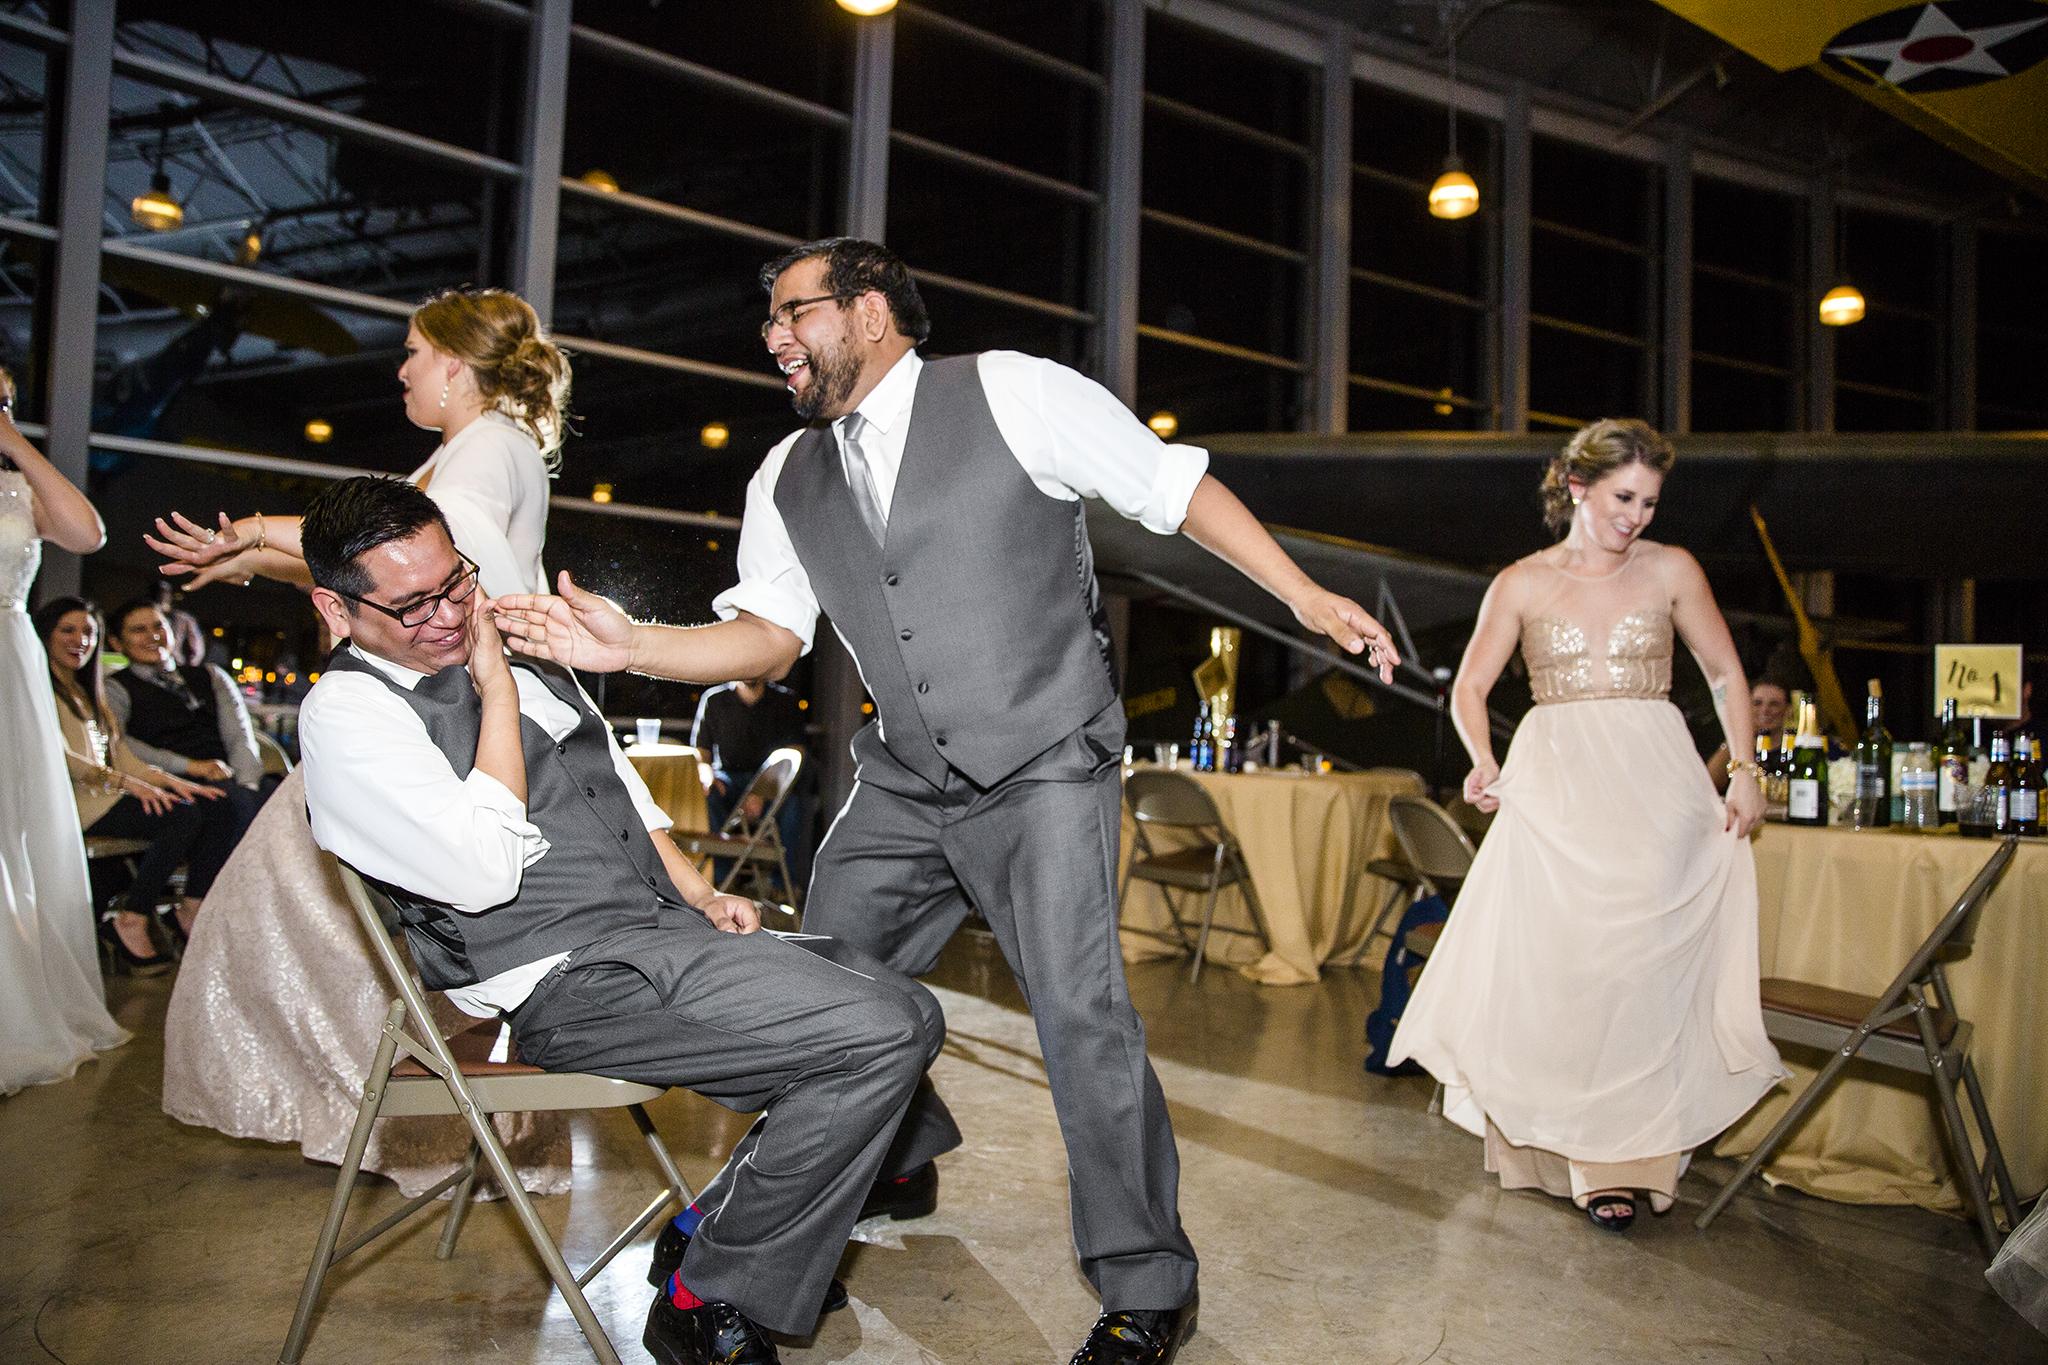 groom lap dance, fun wedding reception, crazy, a little drunk